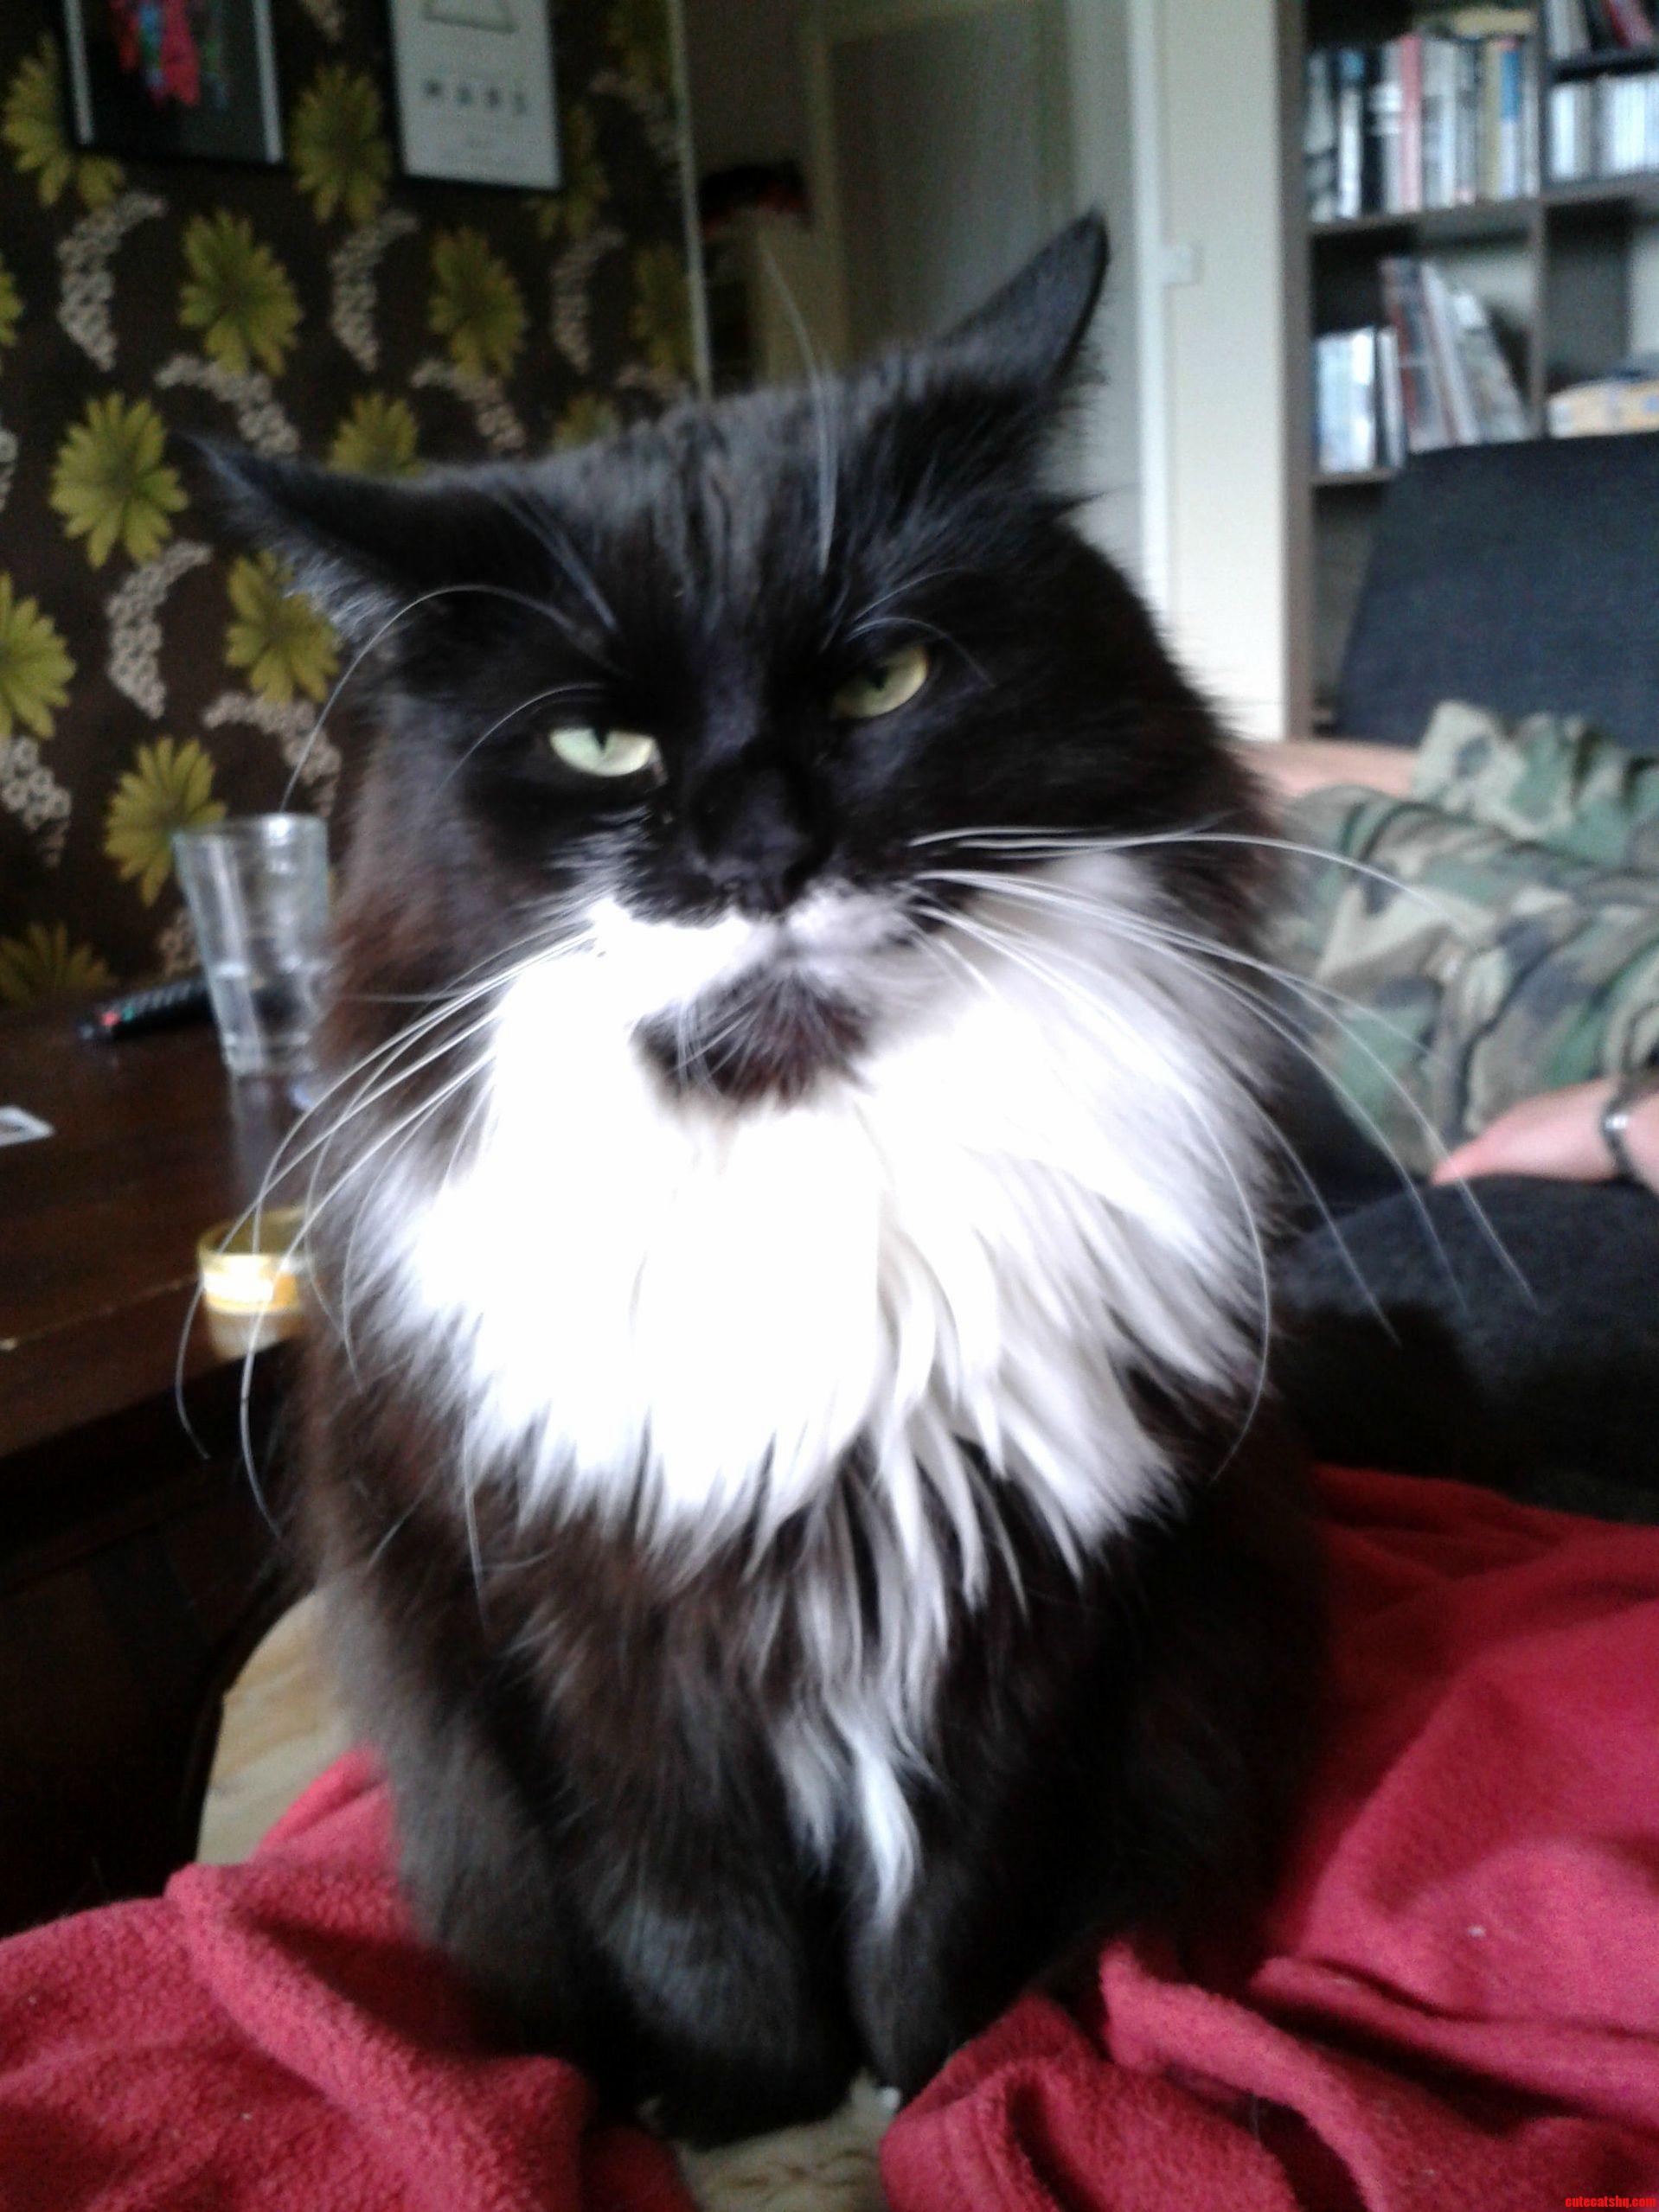 This Cat Has A Great Beard